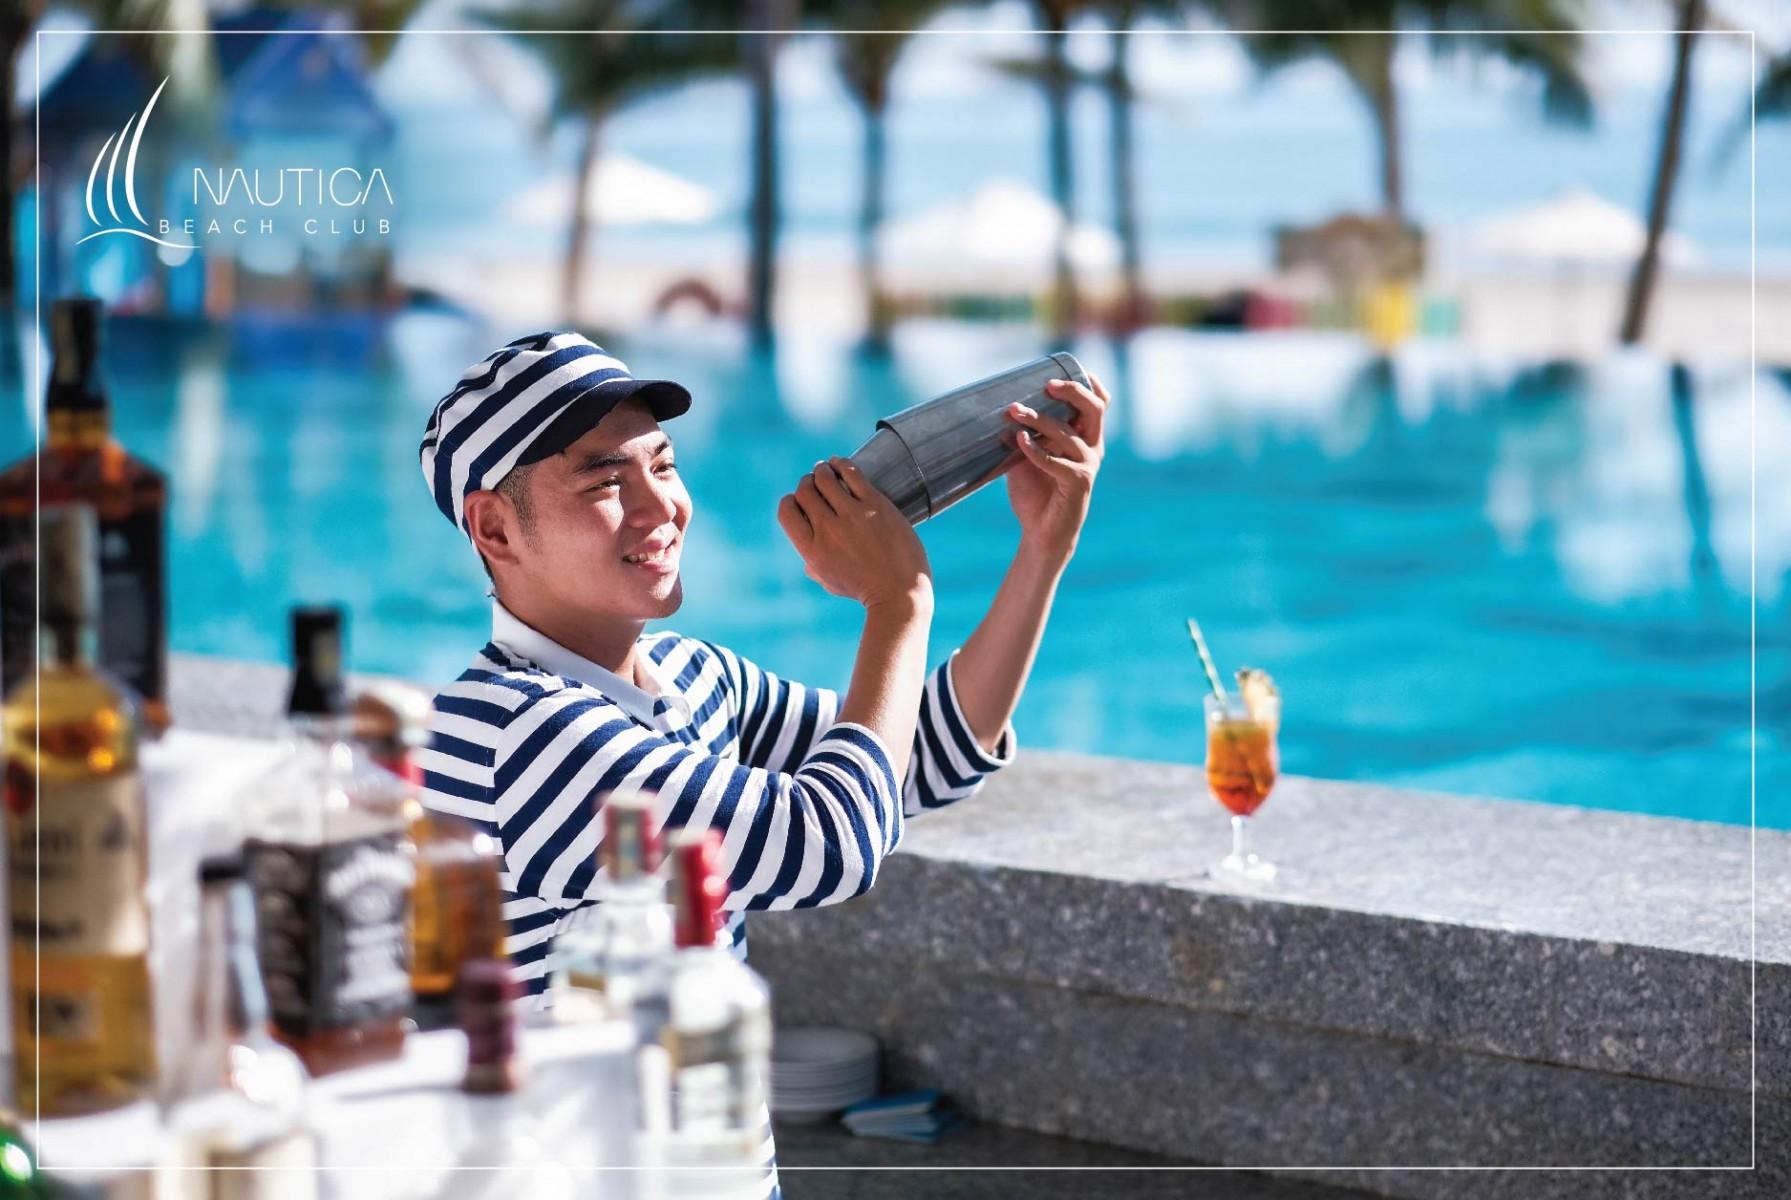 nautica-beach-club